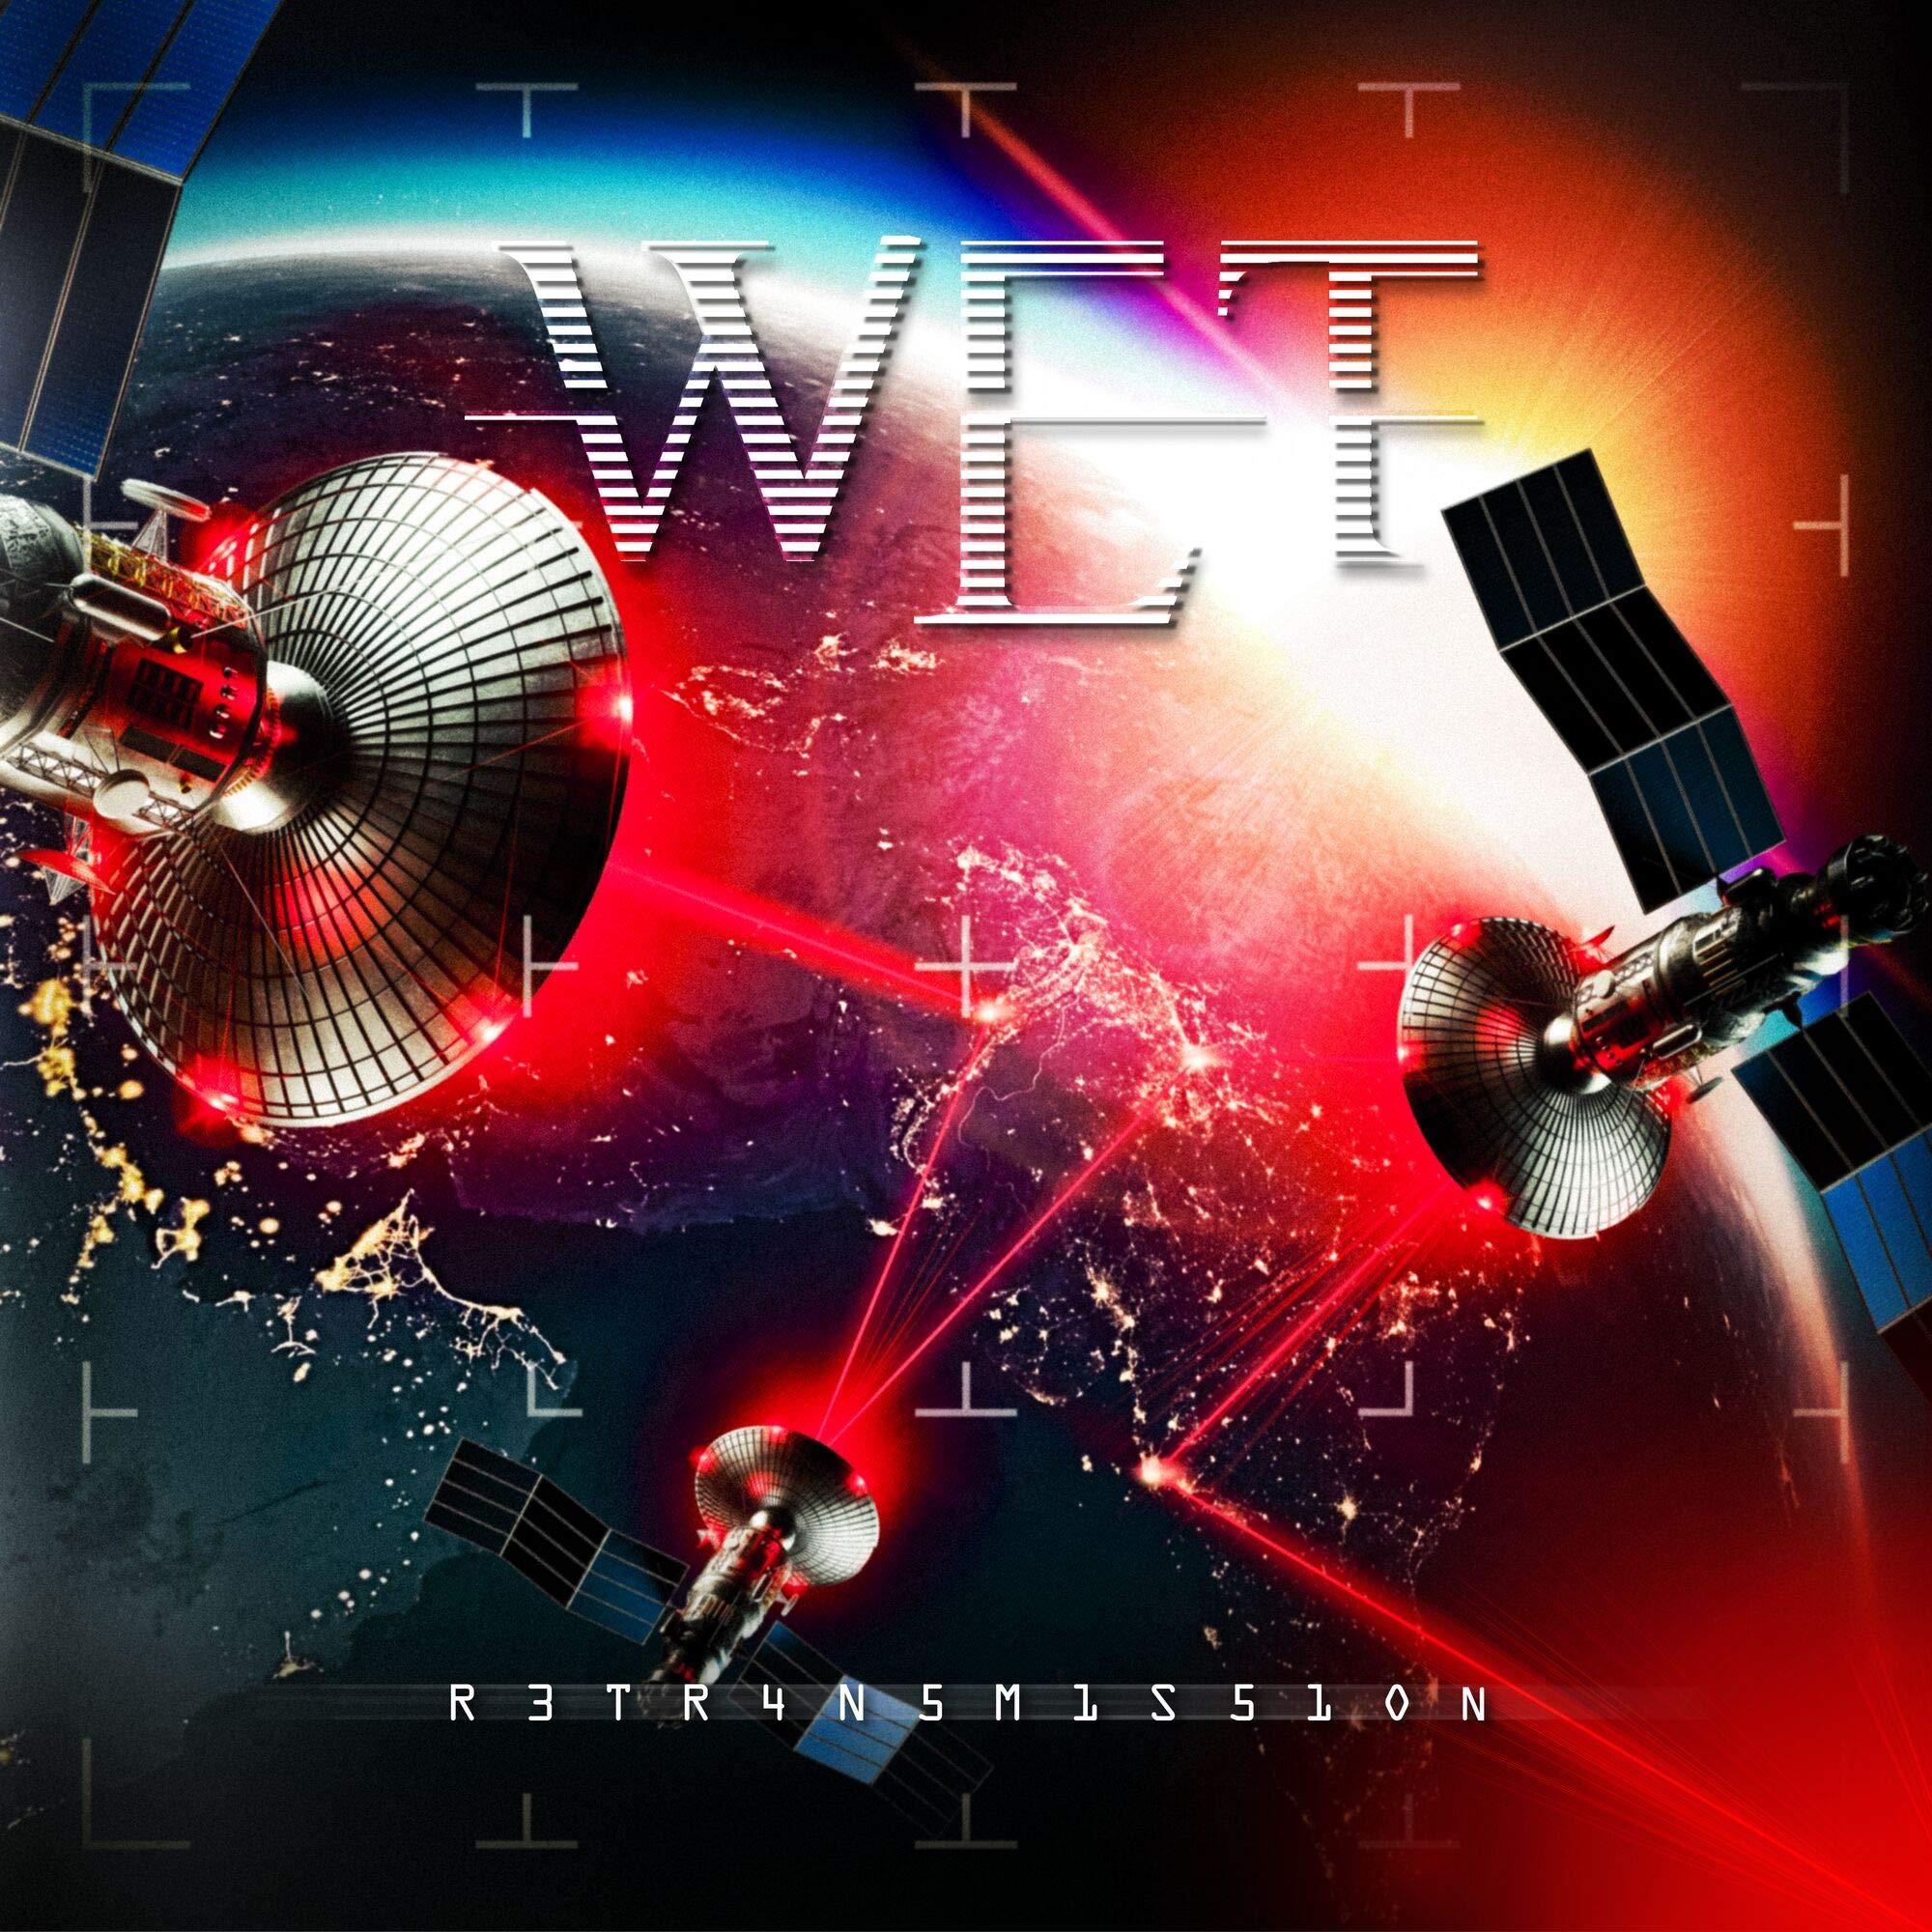 WET – Retransmission (2021) [FLAC]